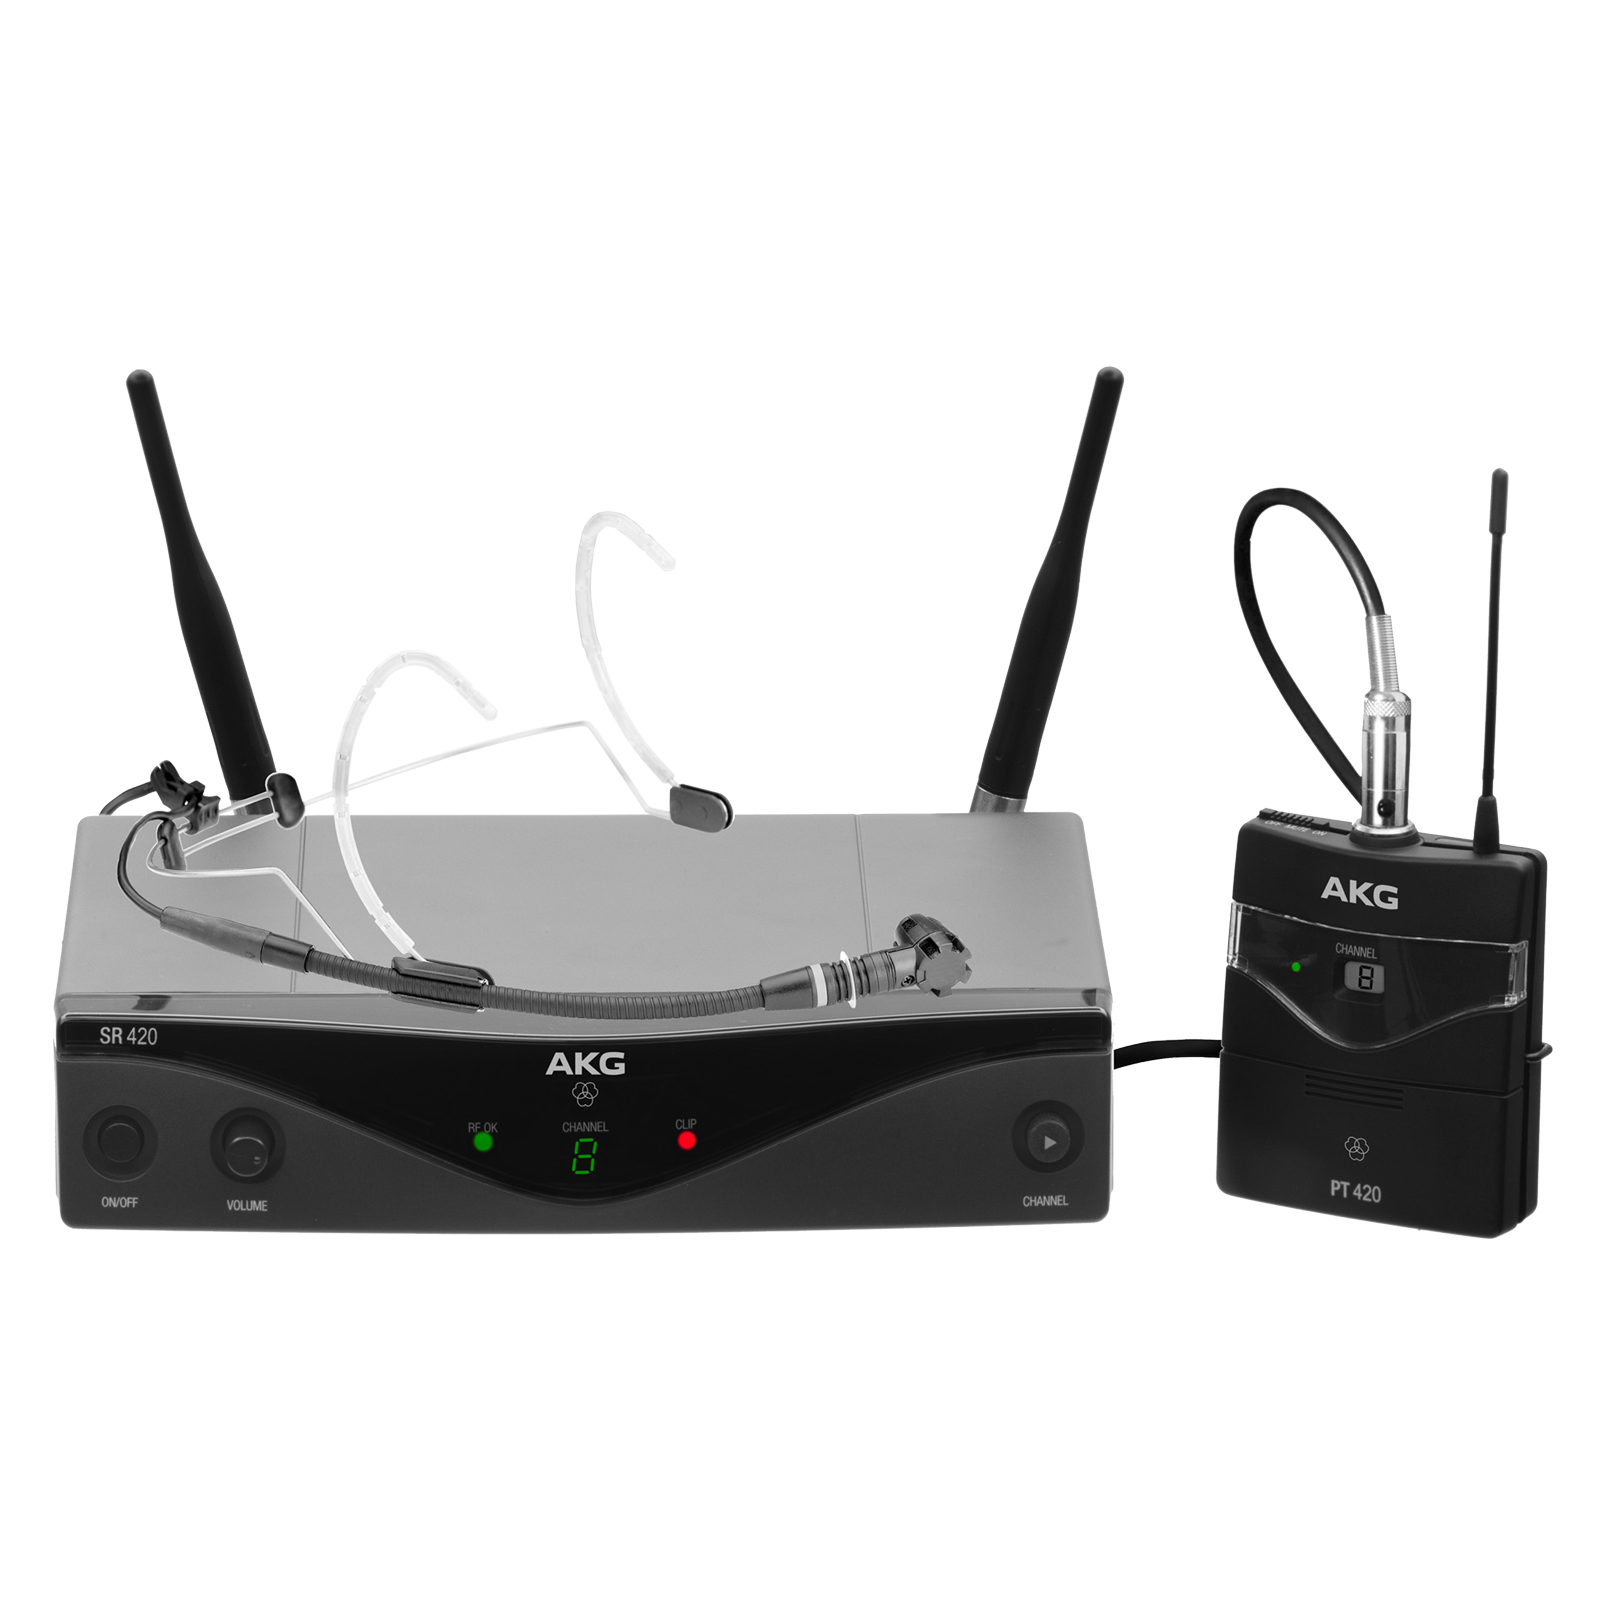 WMS420 Headworn Set Band-A - Black - Professional wireless microphone system - Hero